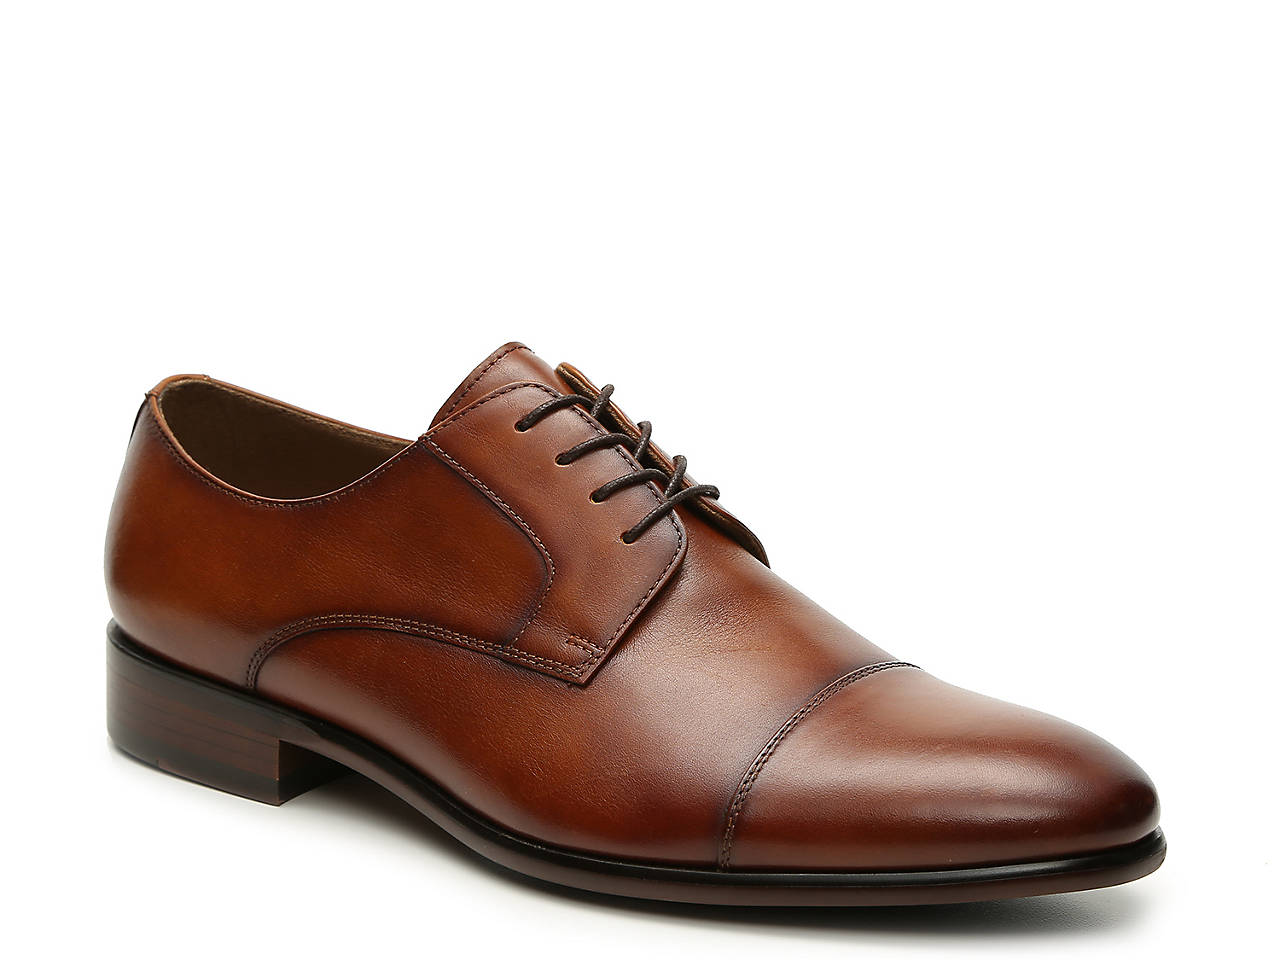 a8990b8b505e Aldo Knaggs Cap Toe Oxford Men s Shoes